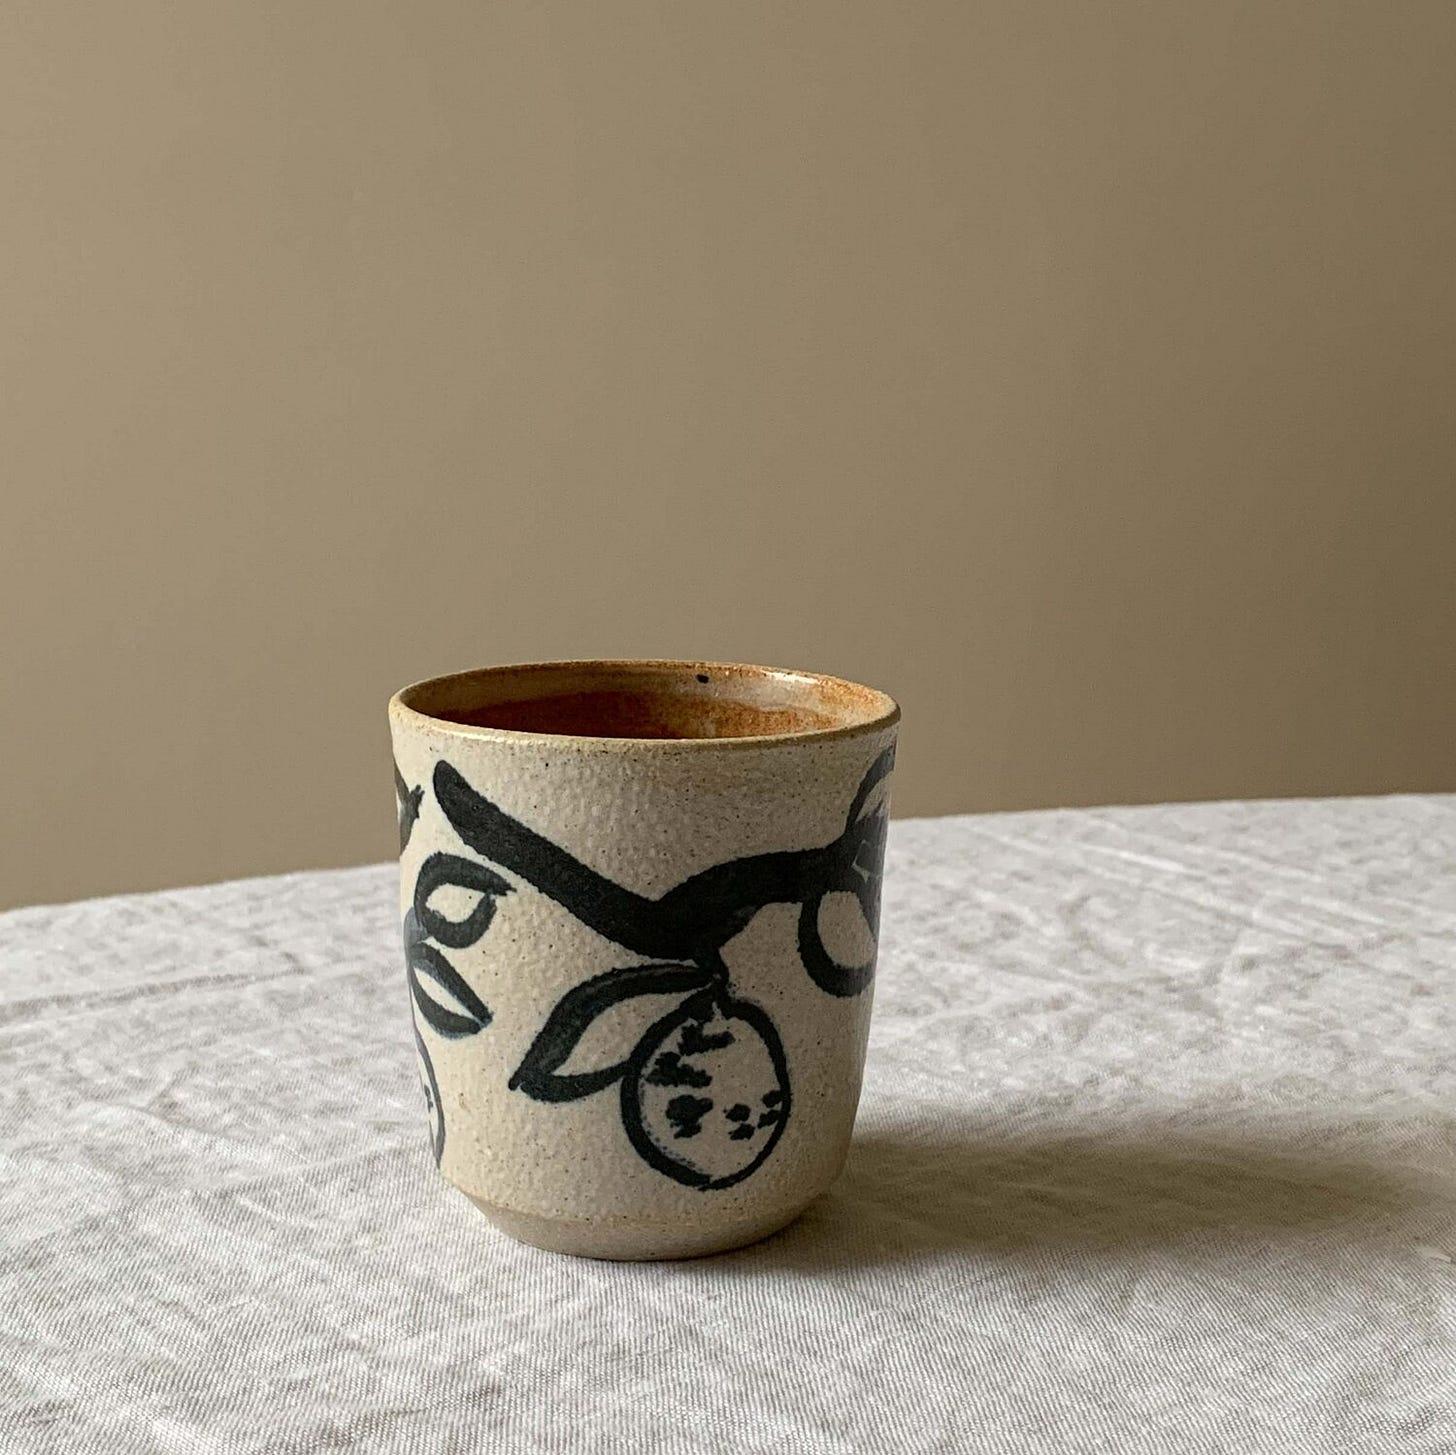 Form-Ceramic-Tumbler-06.jpg